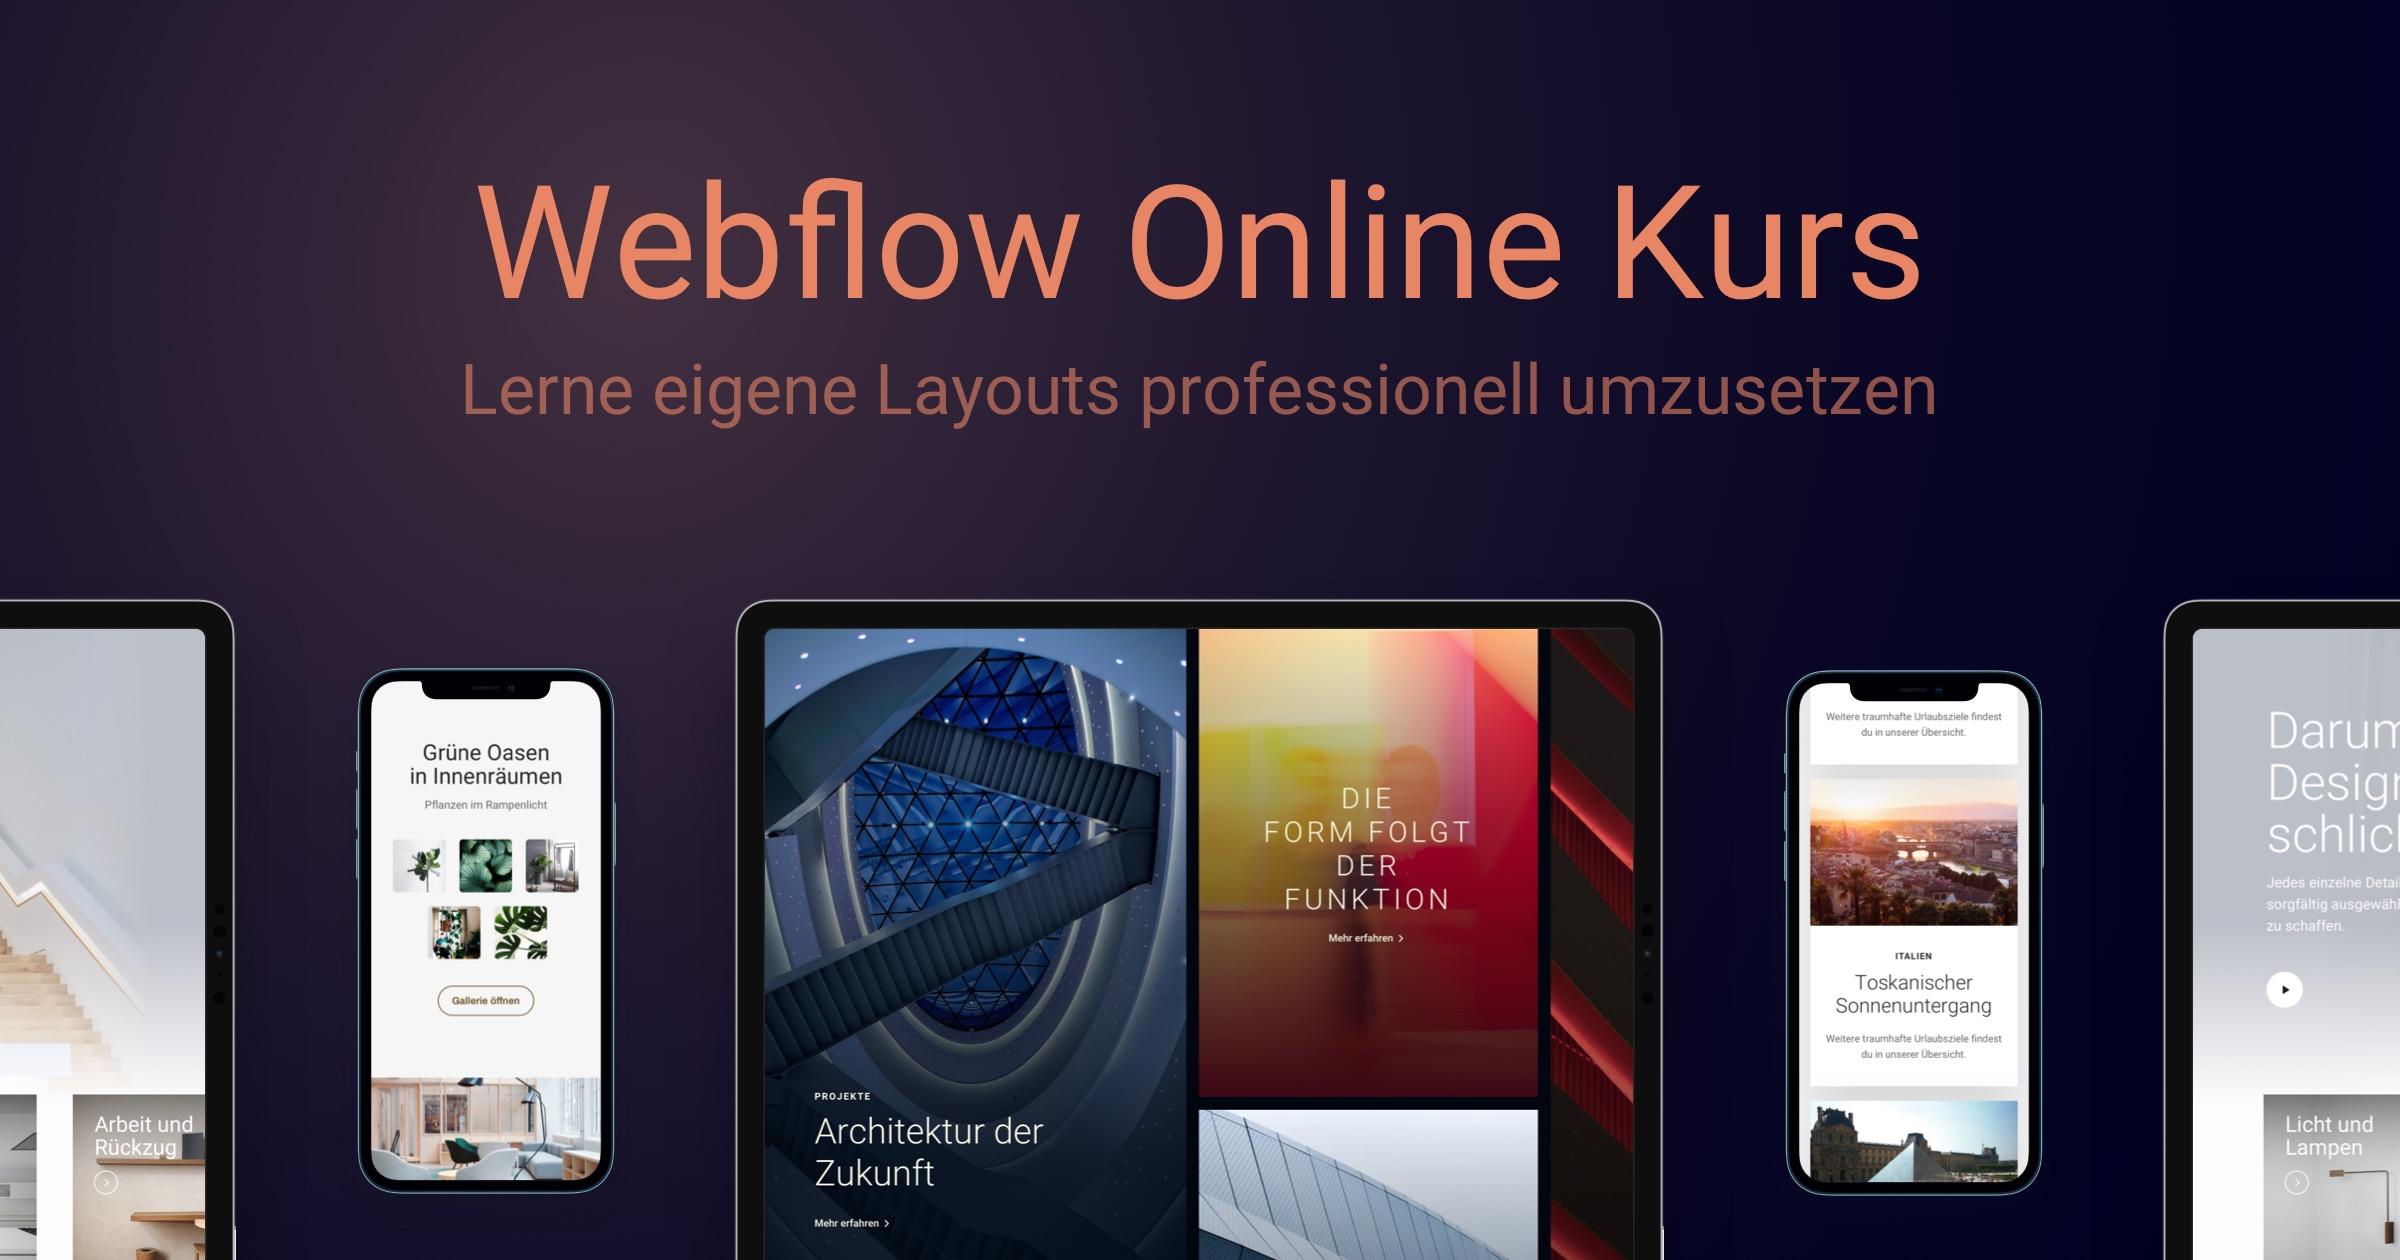 Mein Webdesign Webflow Kurs ist online!